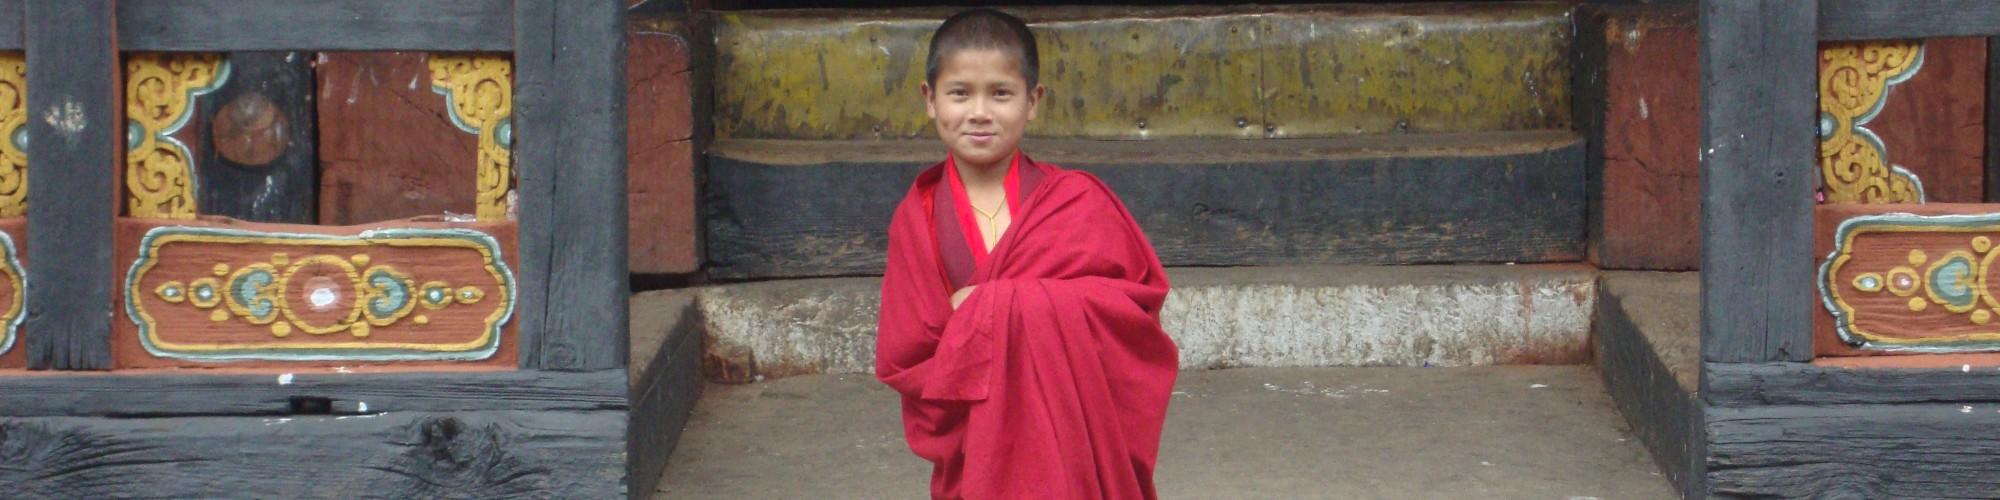 monk in bhutan